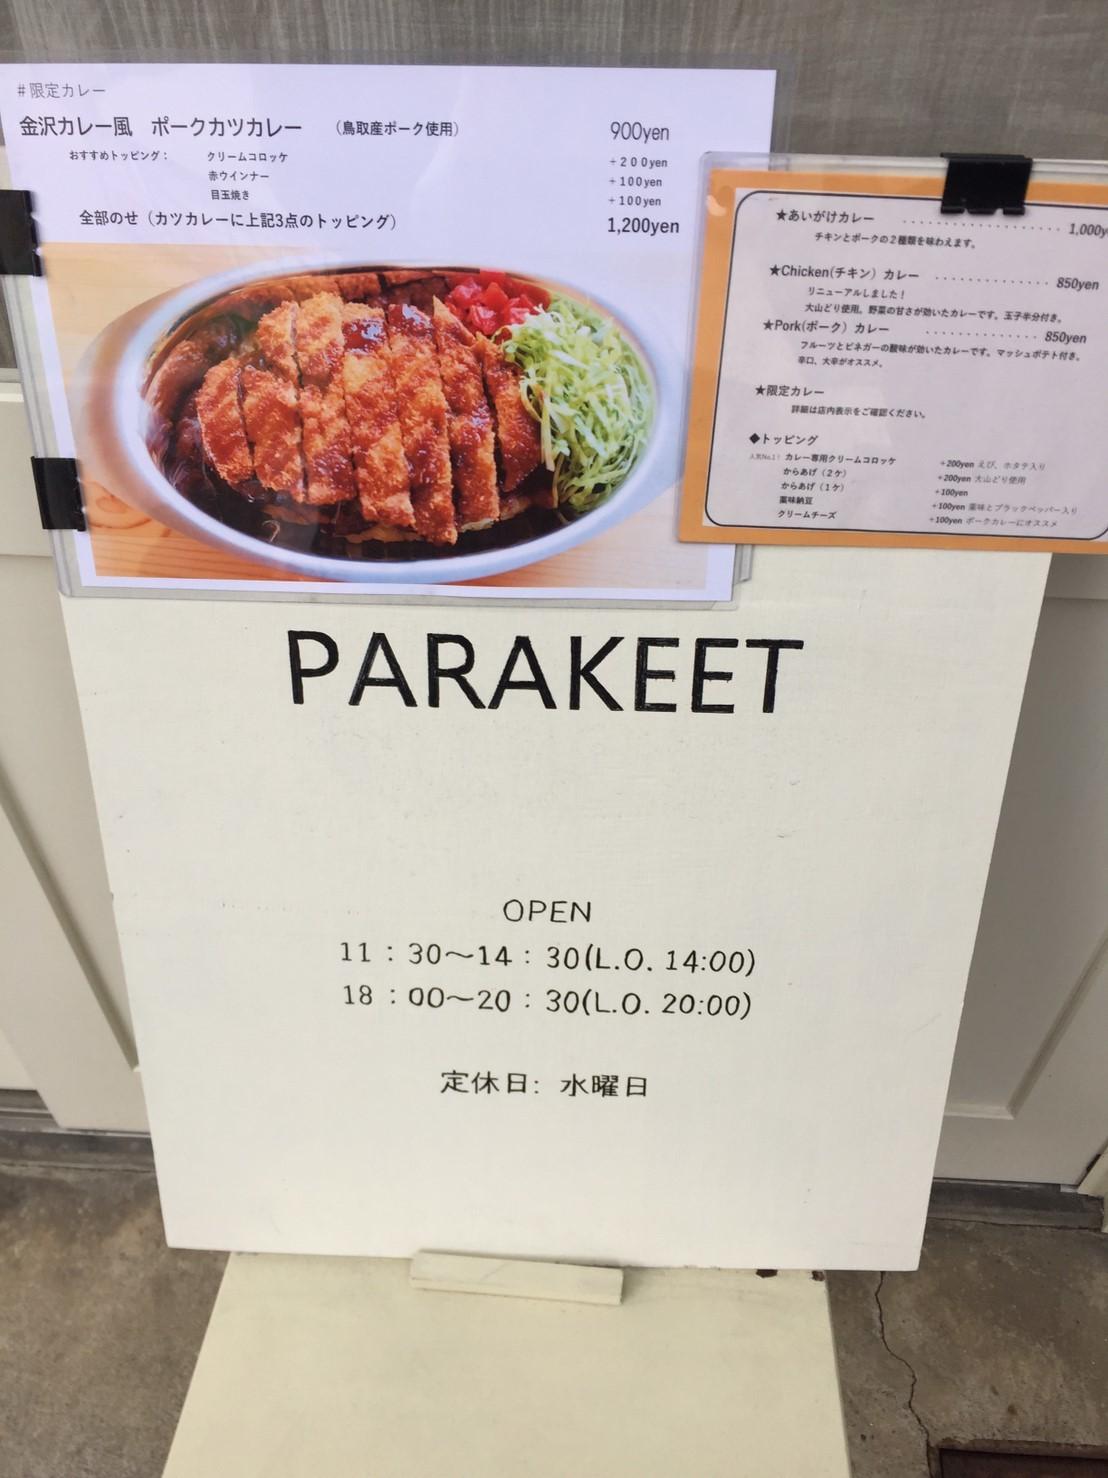 PARAKEET 限定カレー (金沢カレー風 ポークカツカレー)_e0115904_12205864.jpg